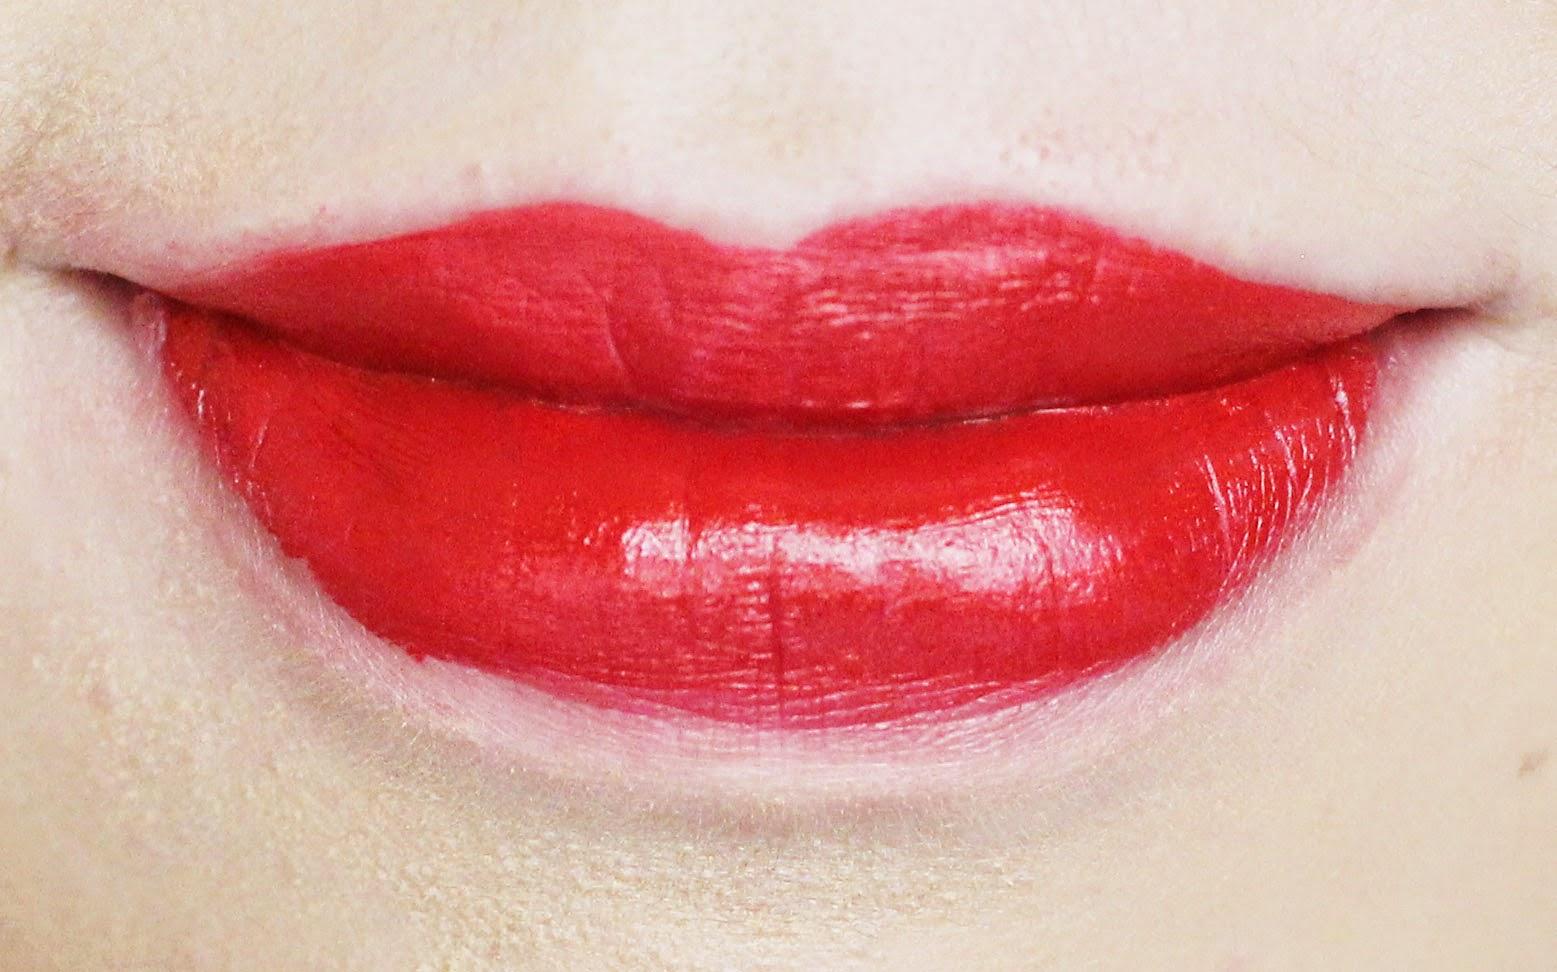 NARS Audacious Lipstick Swatches Rita